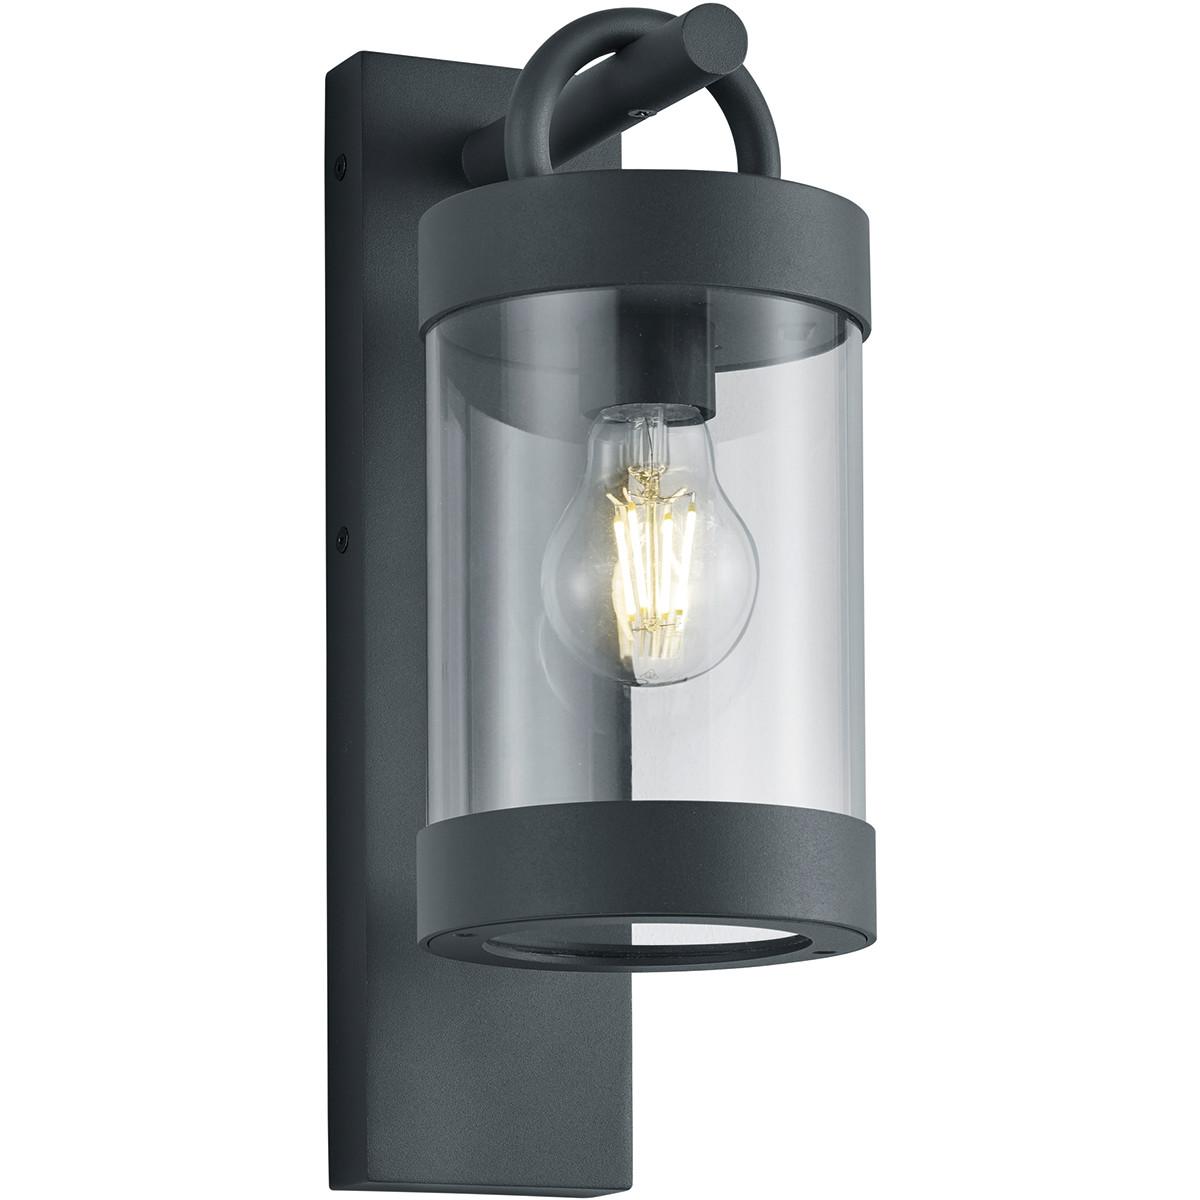 LED Tuinverlichting - Tuinlamp - Trion Semby - Wand - Lichtsensor - E27 Fitting - Mat Zwart - Alumin